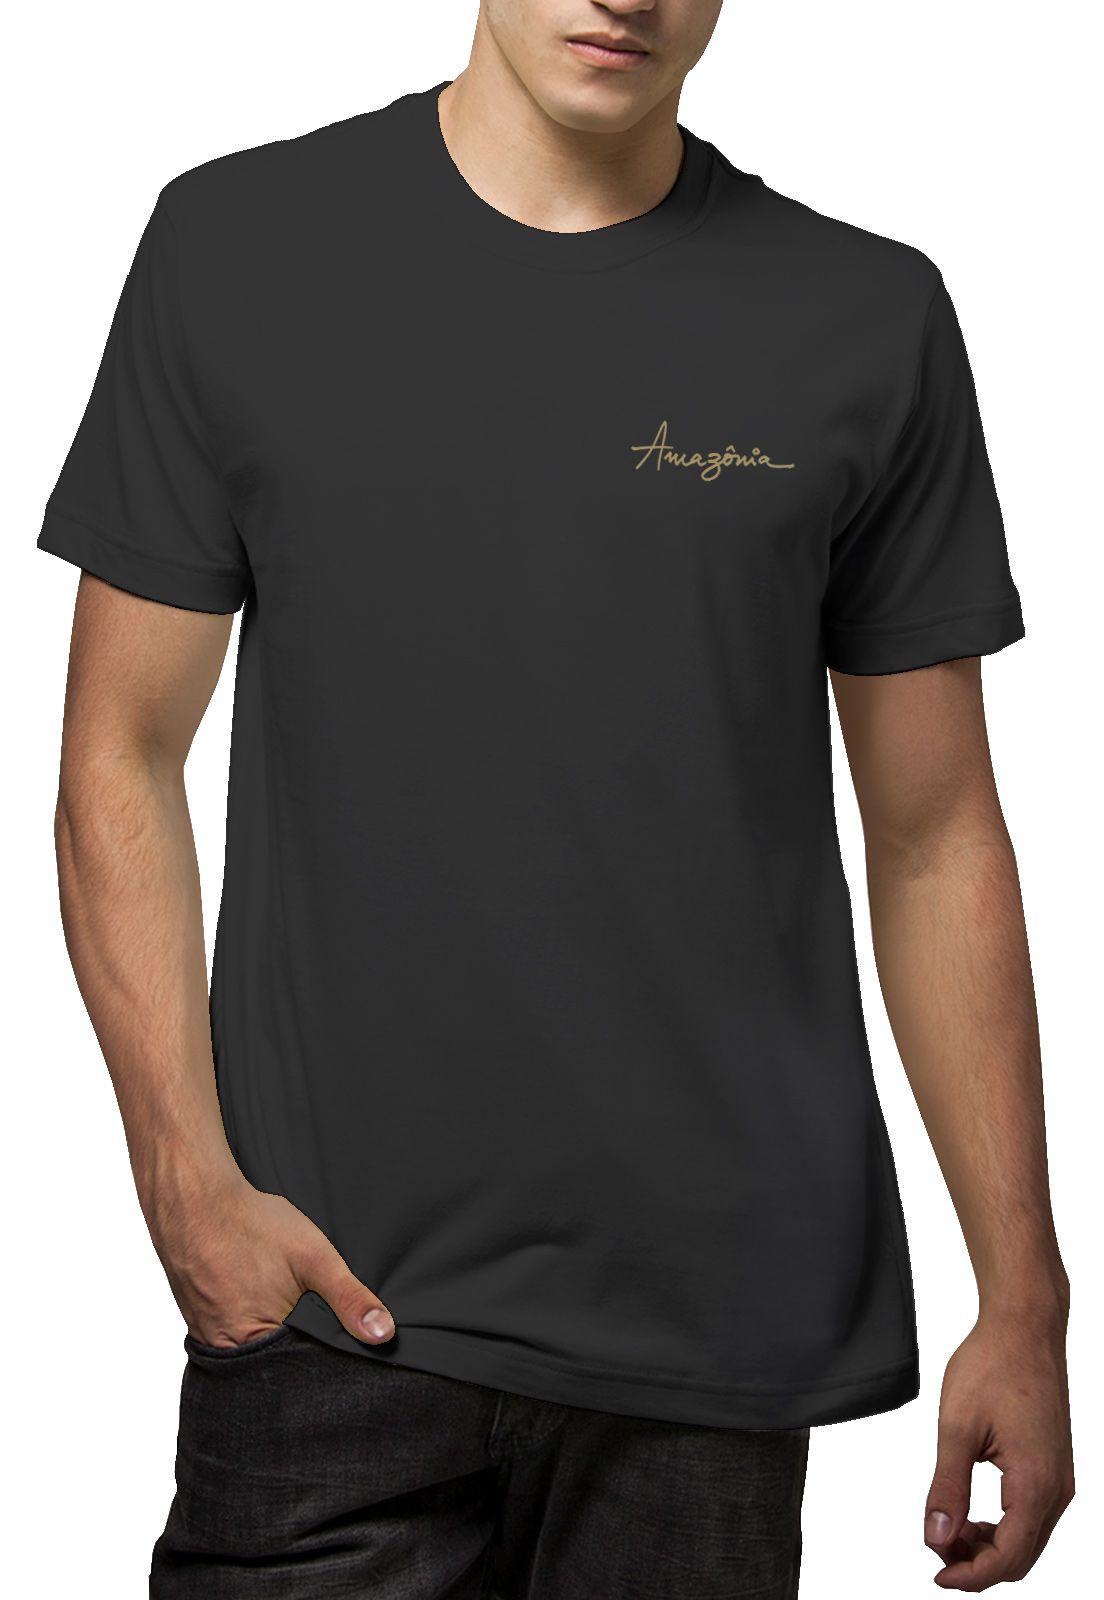 Camiseta Amazônia Penas Cosmos - Cinza Escuro